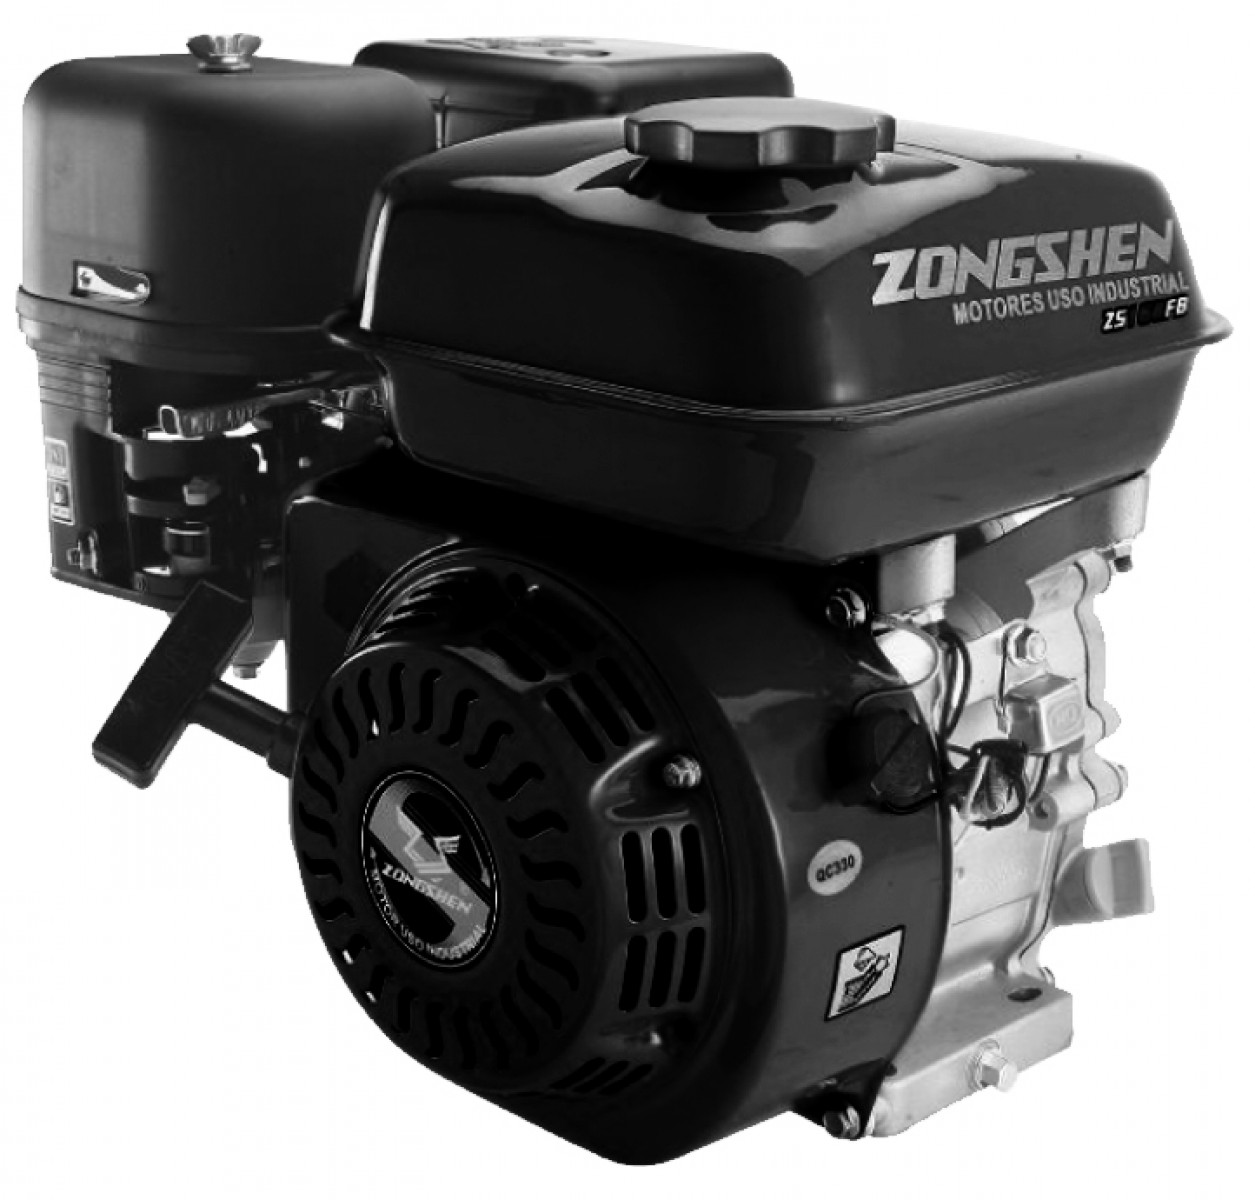 Motor ZONGSHEN 168FB 196cc 6,5 HŘÍDEL 19mm